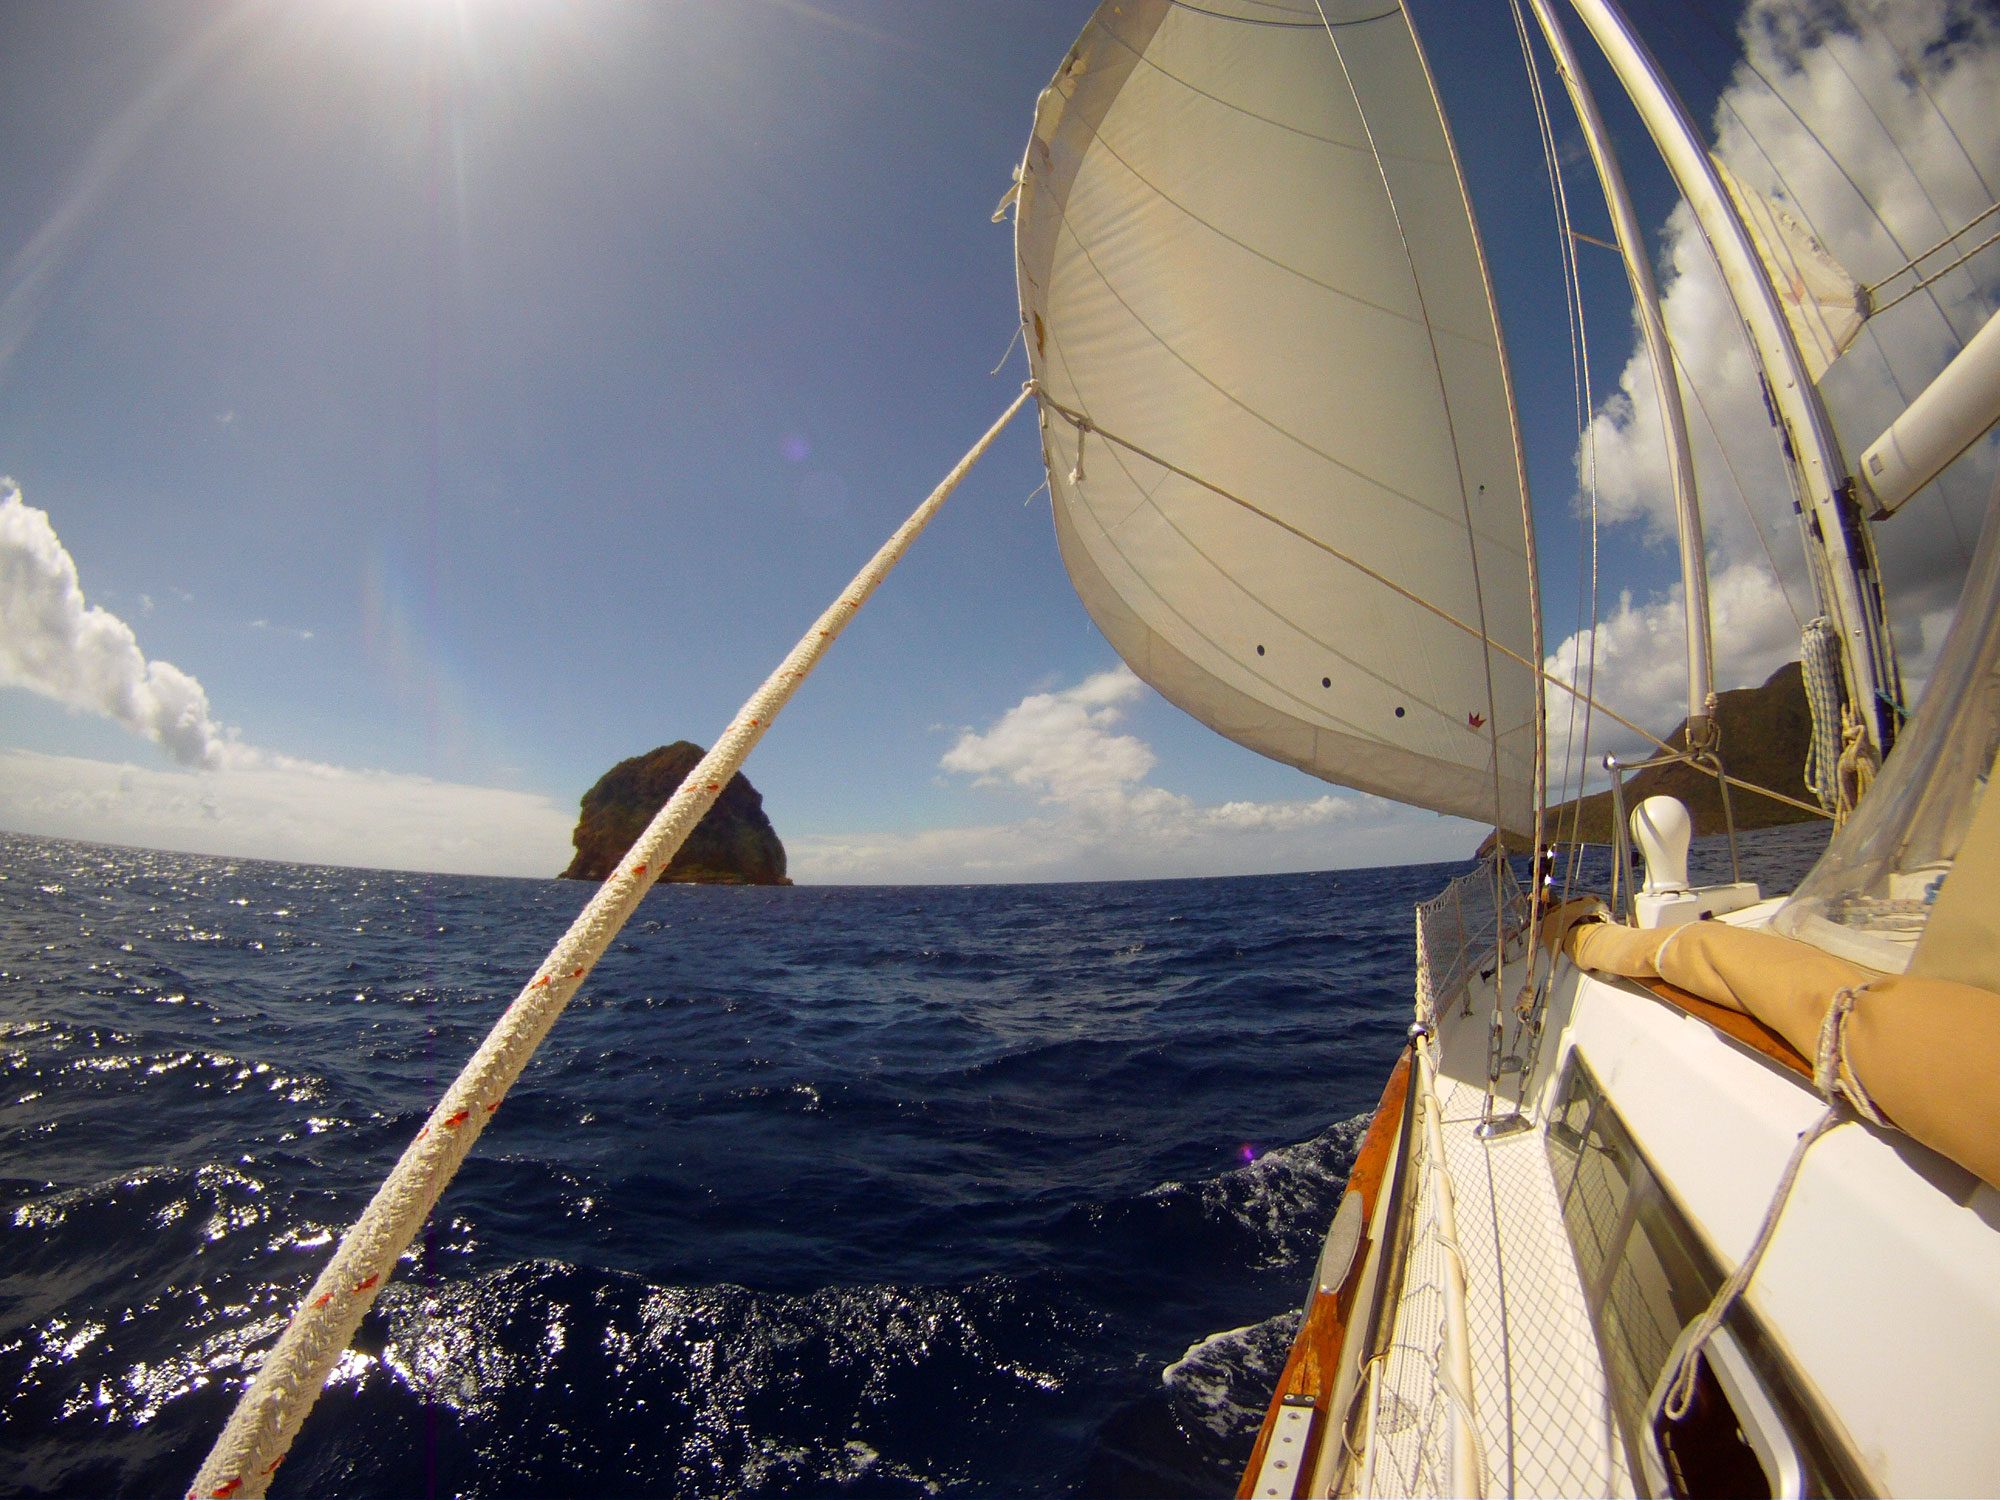 Sailing-the-caribbean